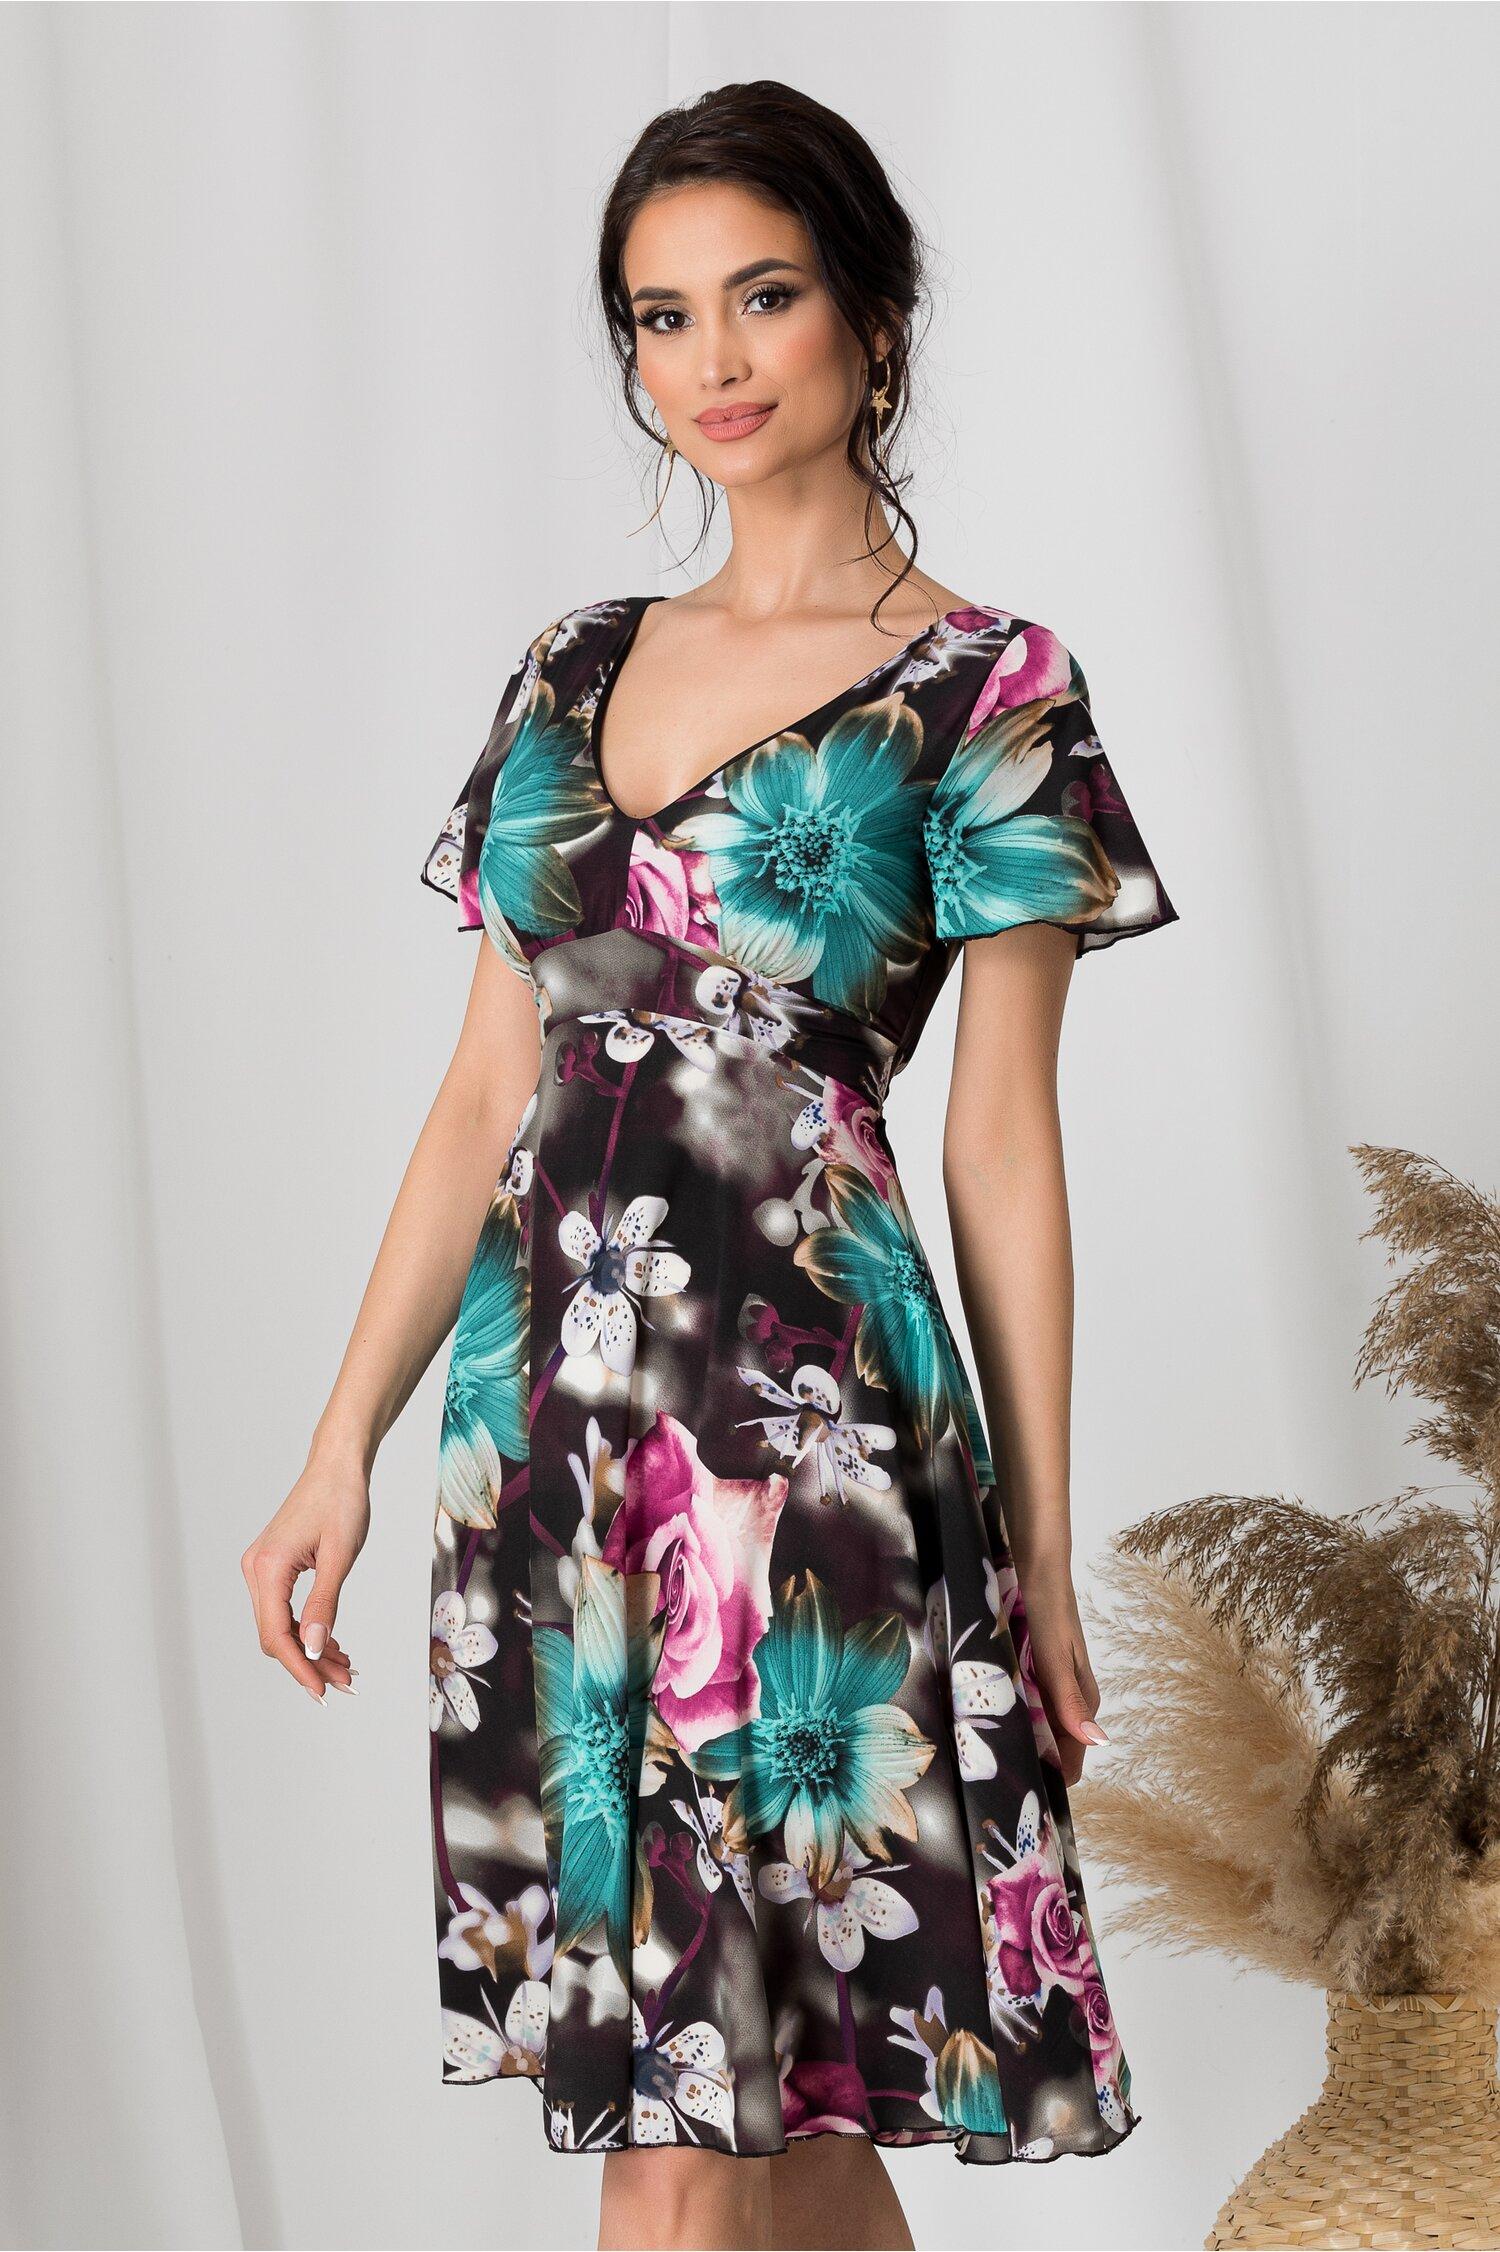 Rochie Amelia neagra de zi cu flori turcoaz si lila imagine dyfashion.ro 2021